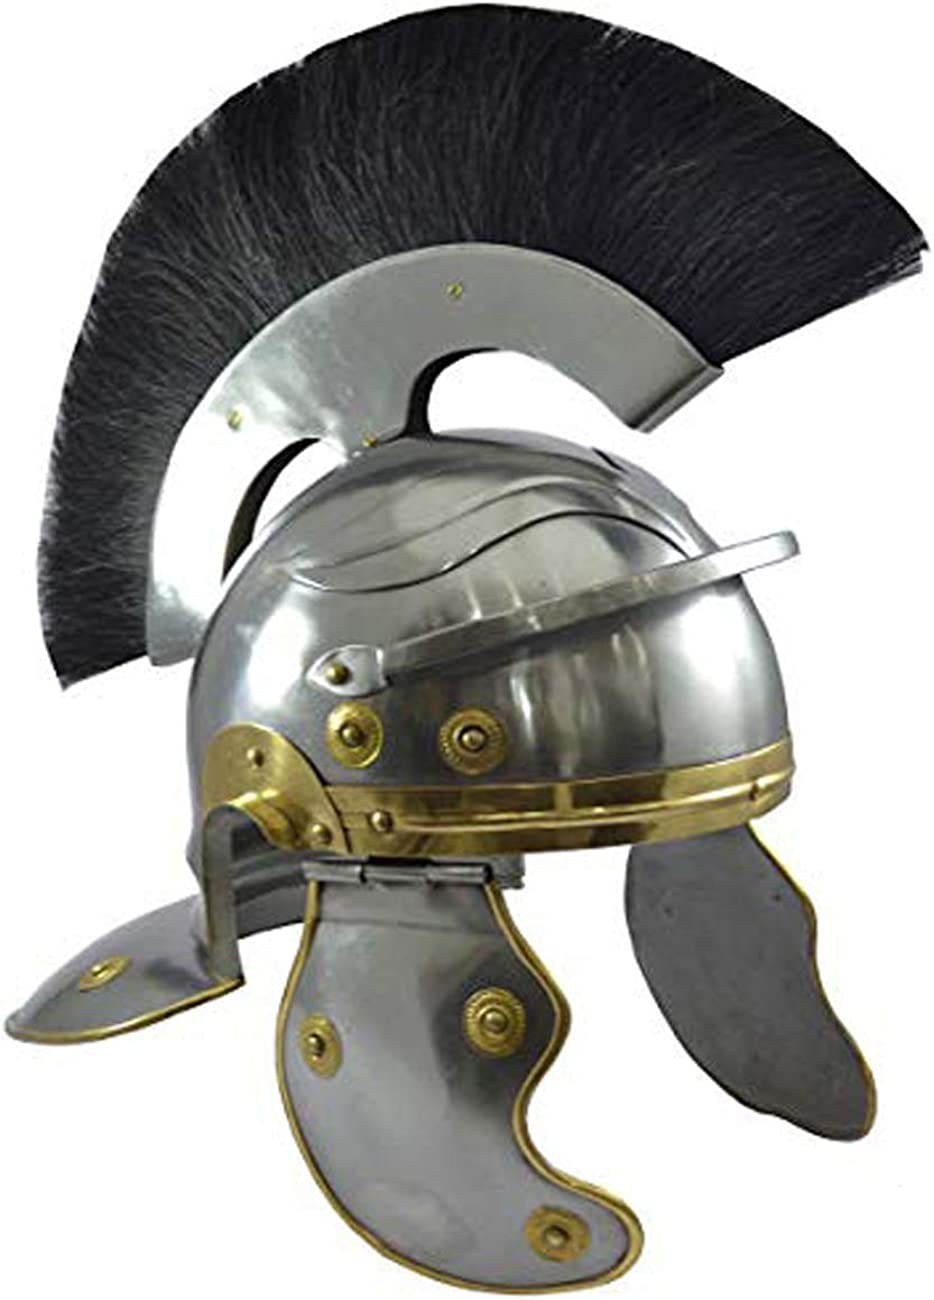 AnNafi Roman Centurion Helmet Armor w/ Black Plume | Medieval Metal Replica Helm | Soldier Costume Gladiator